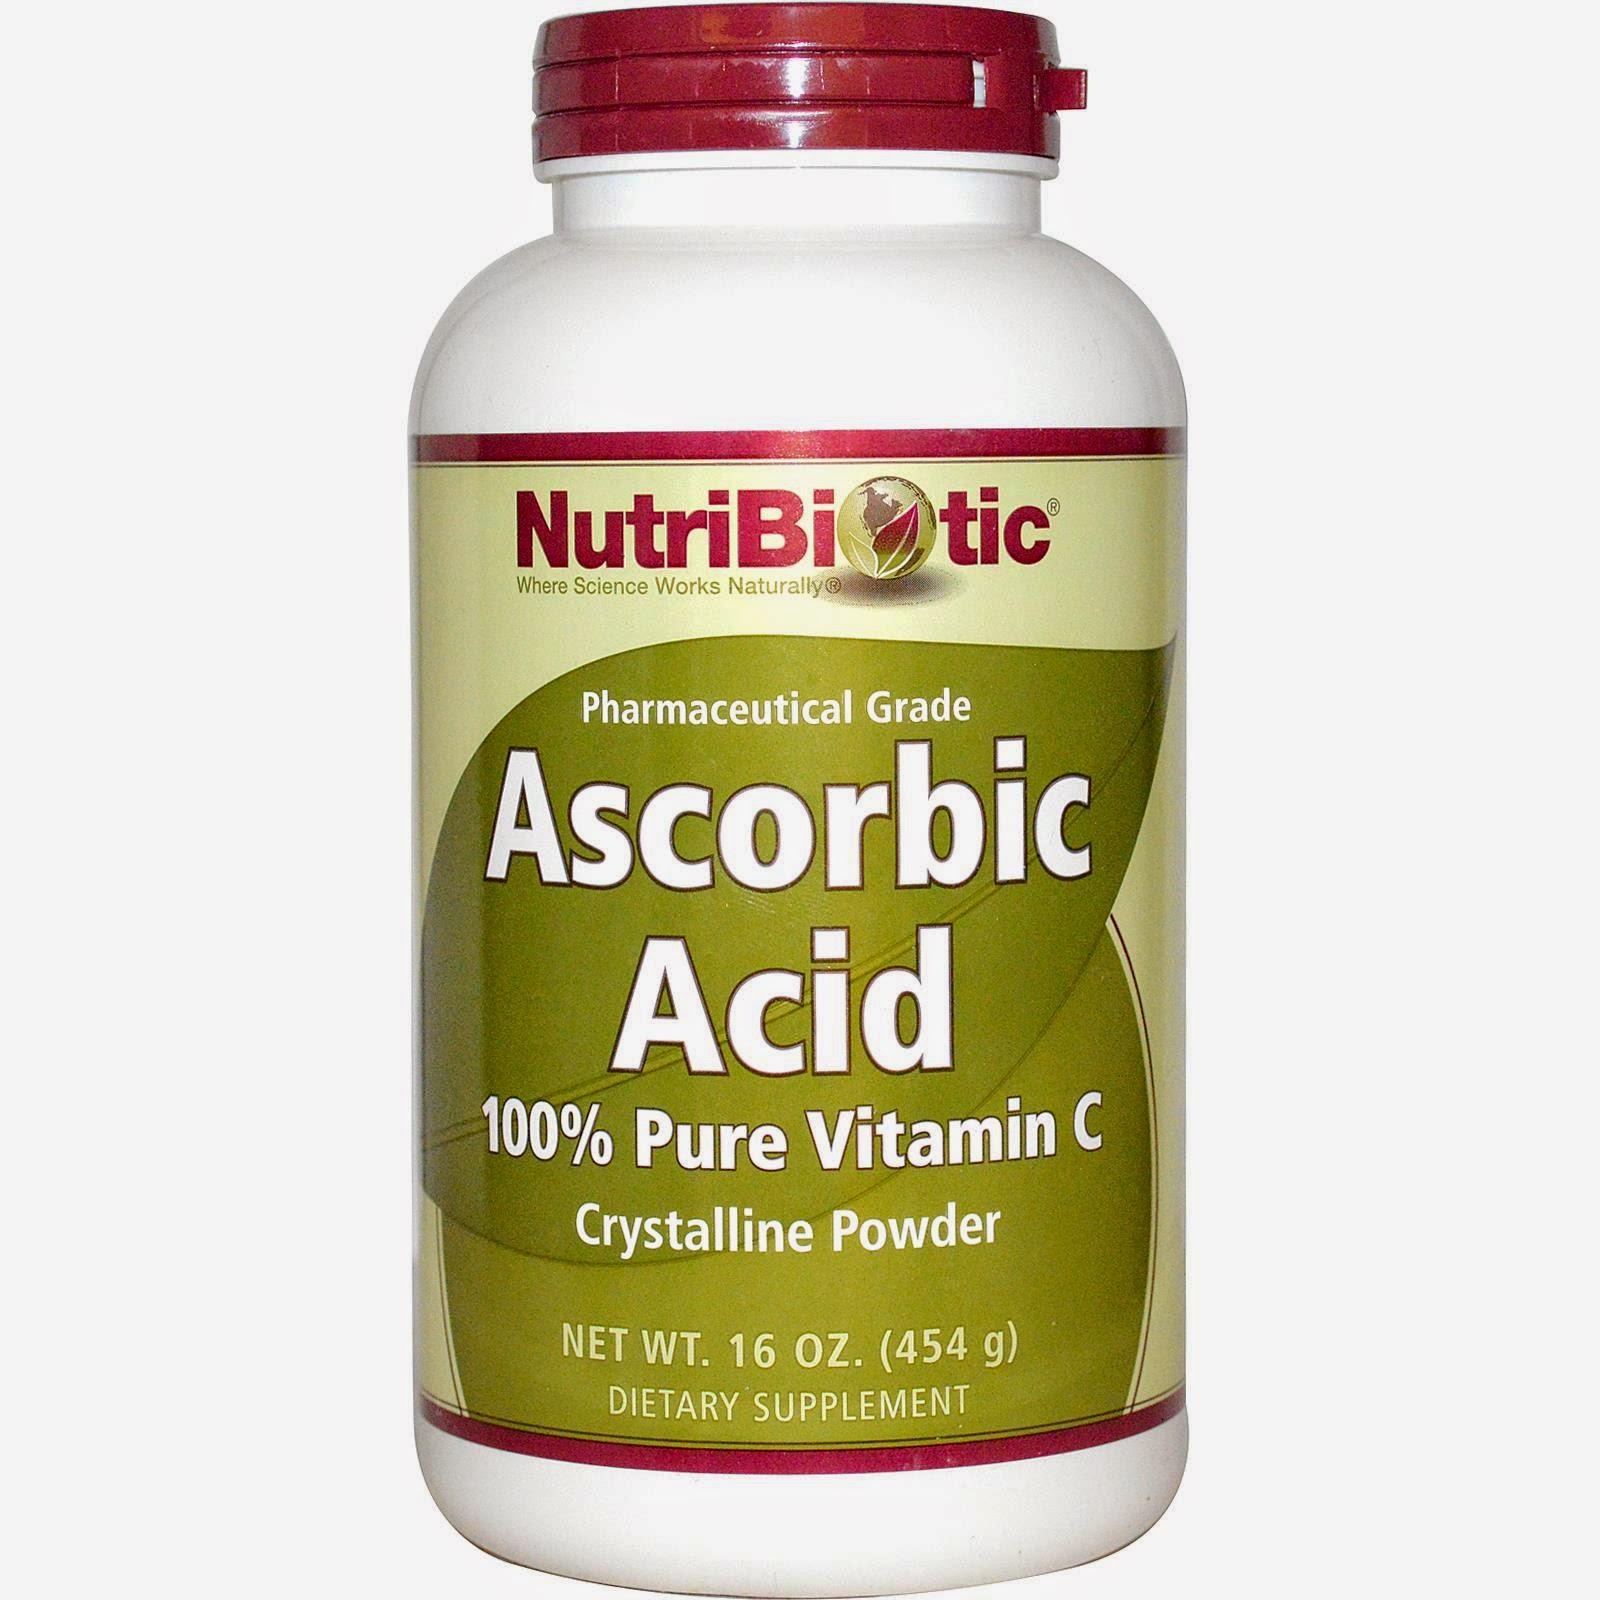 http://www.iherb.com/nutribiotic-ascorbic-acid-crystalline-powder-16-oz-454-g/24191?rcode=dbg731